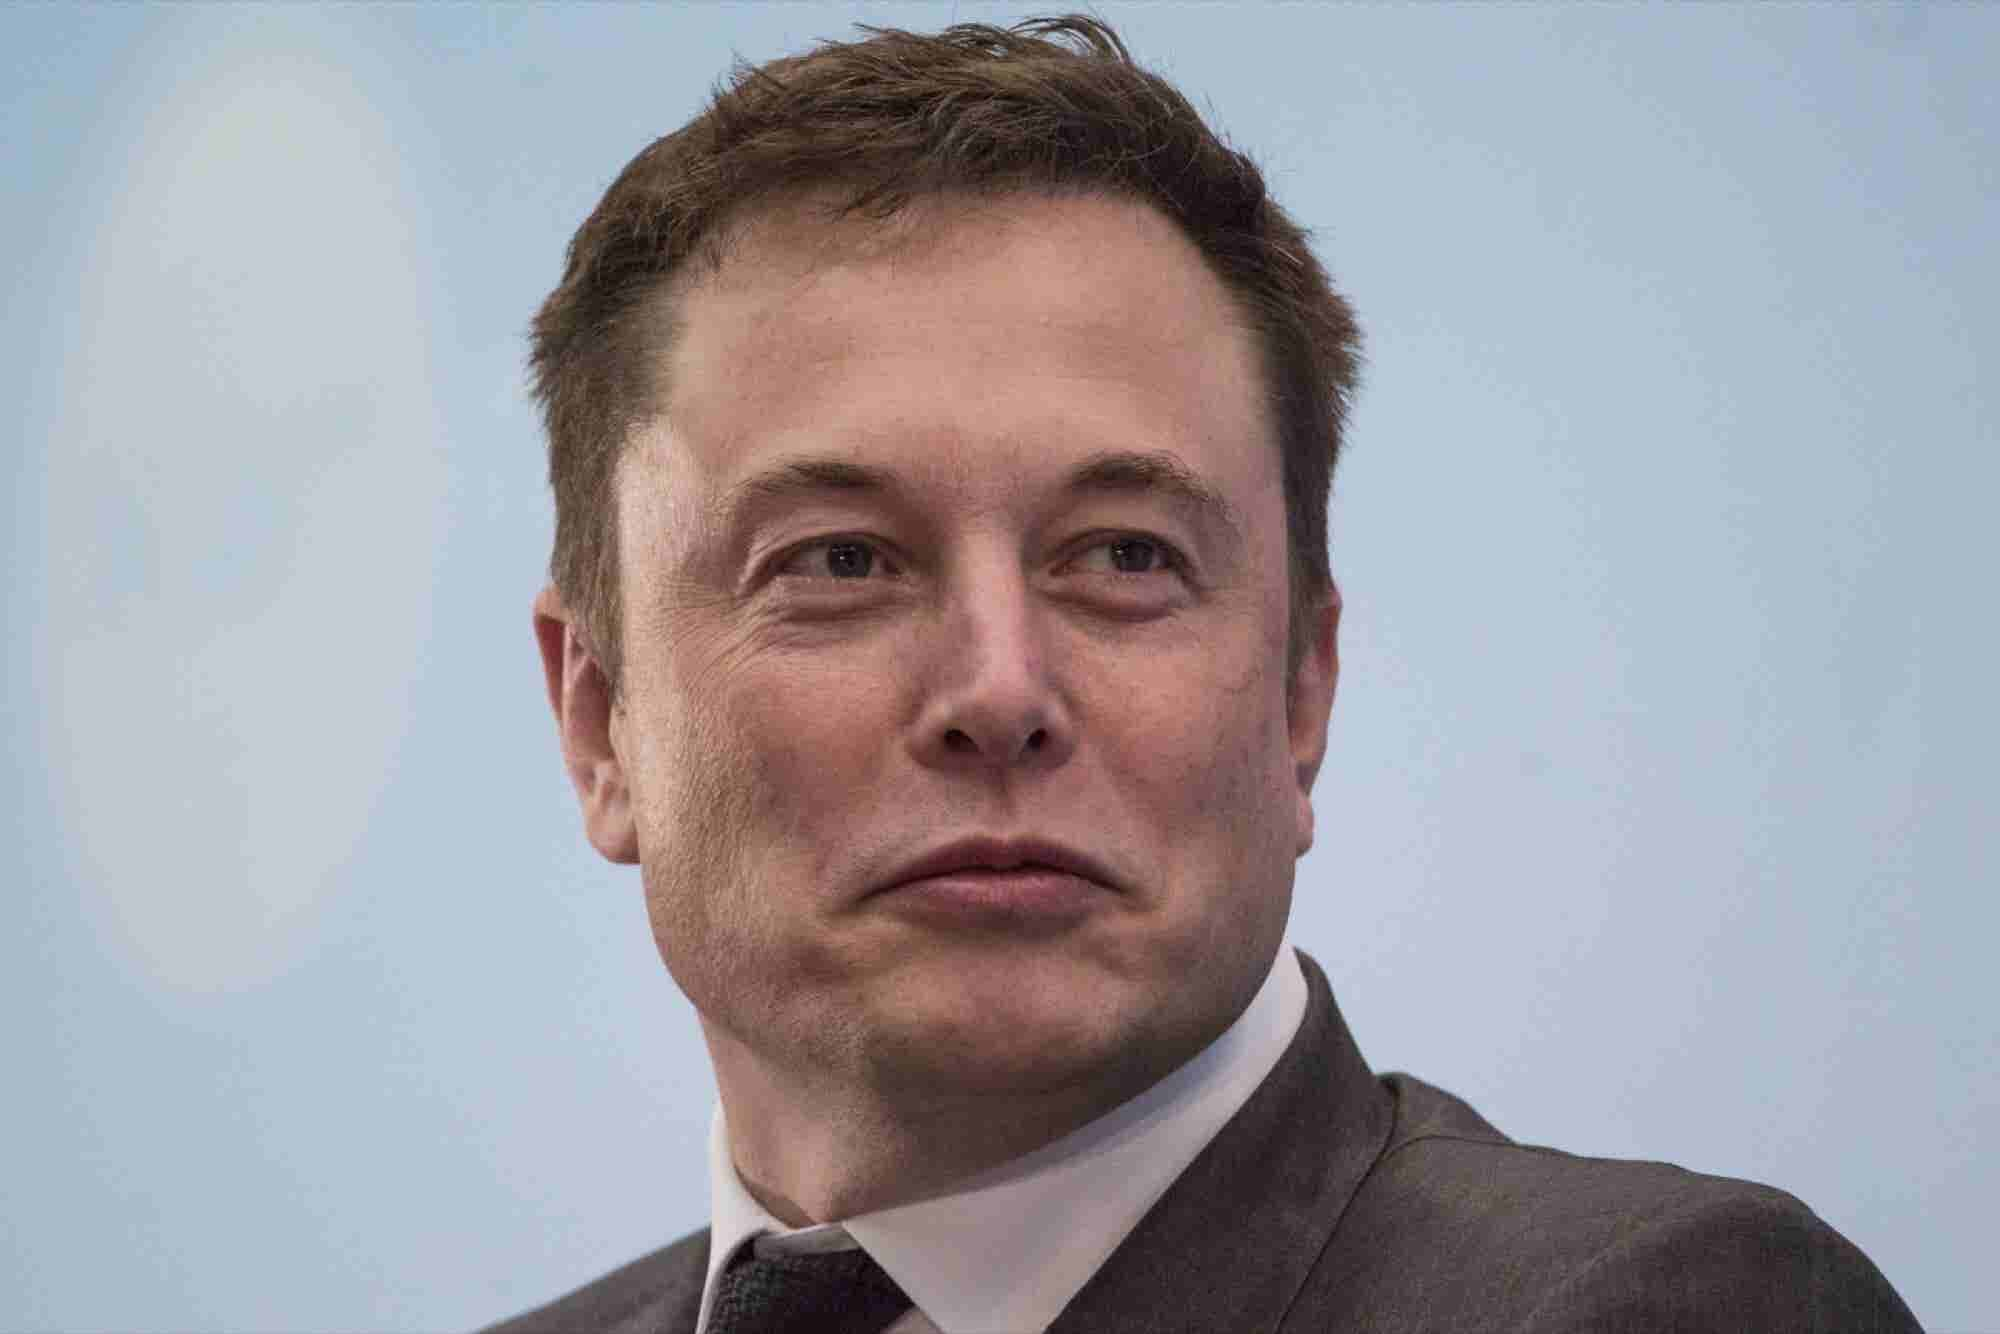 Elon Musk Says Crack Helps Him Survive on No Sleep